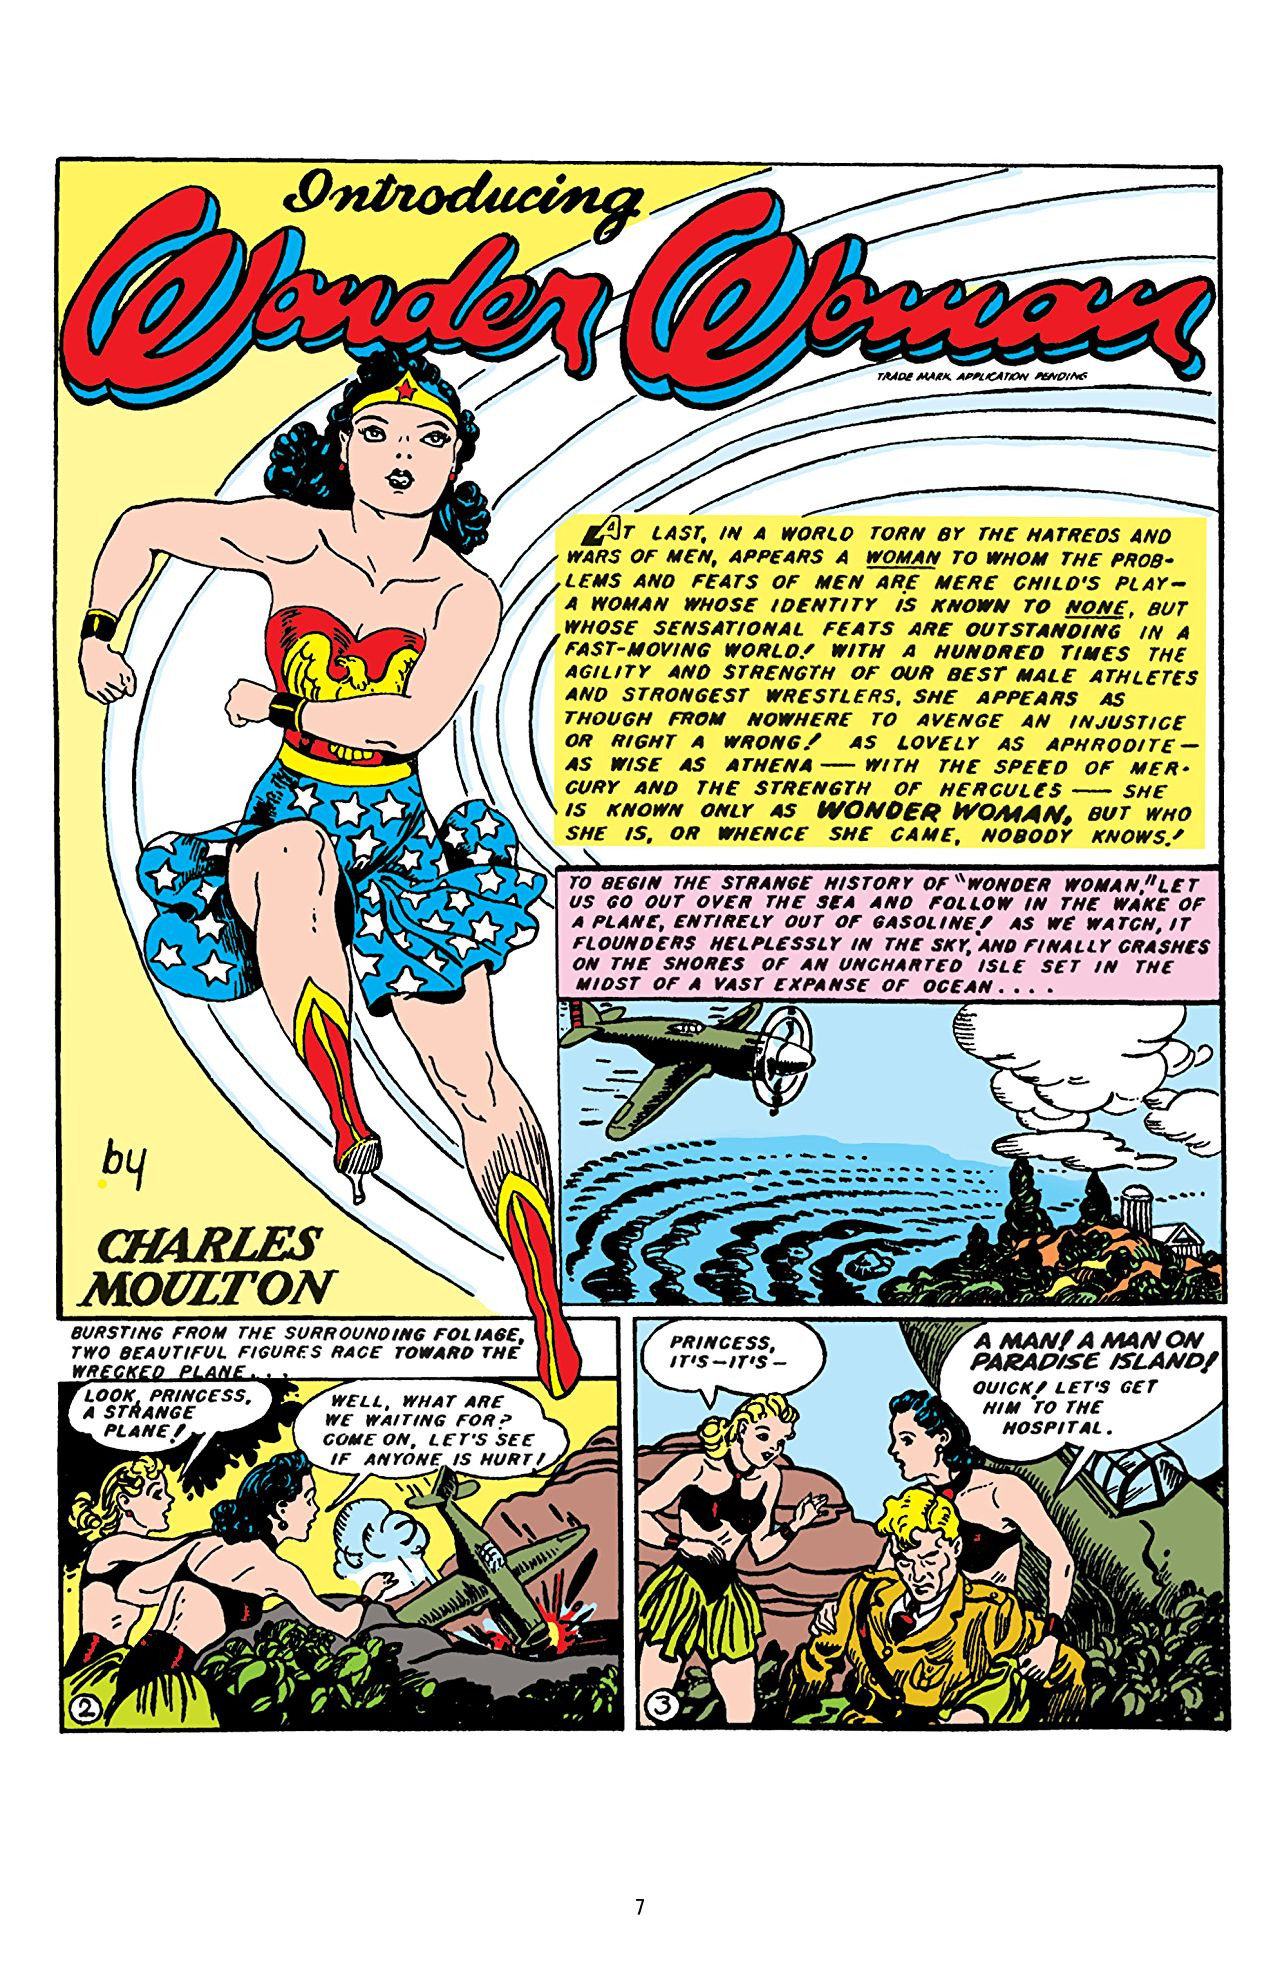 Golden Age Wonder Woman.jpg